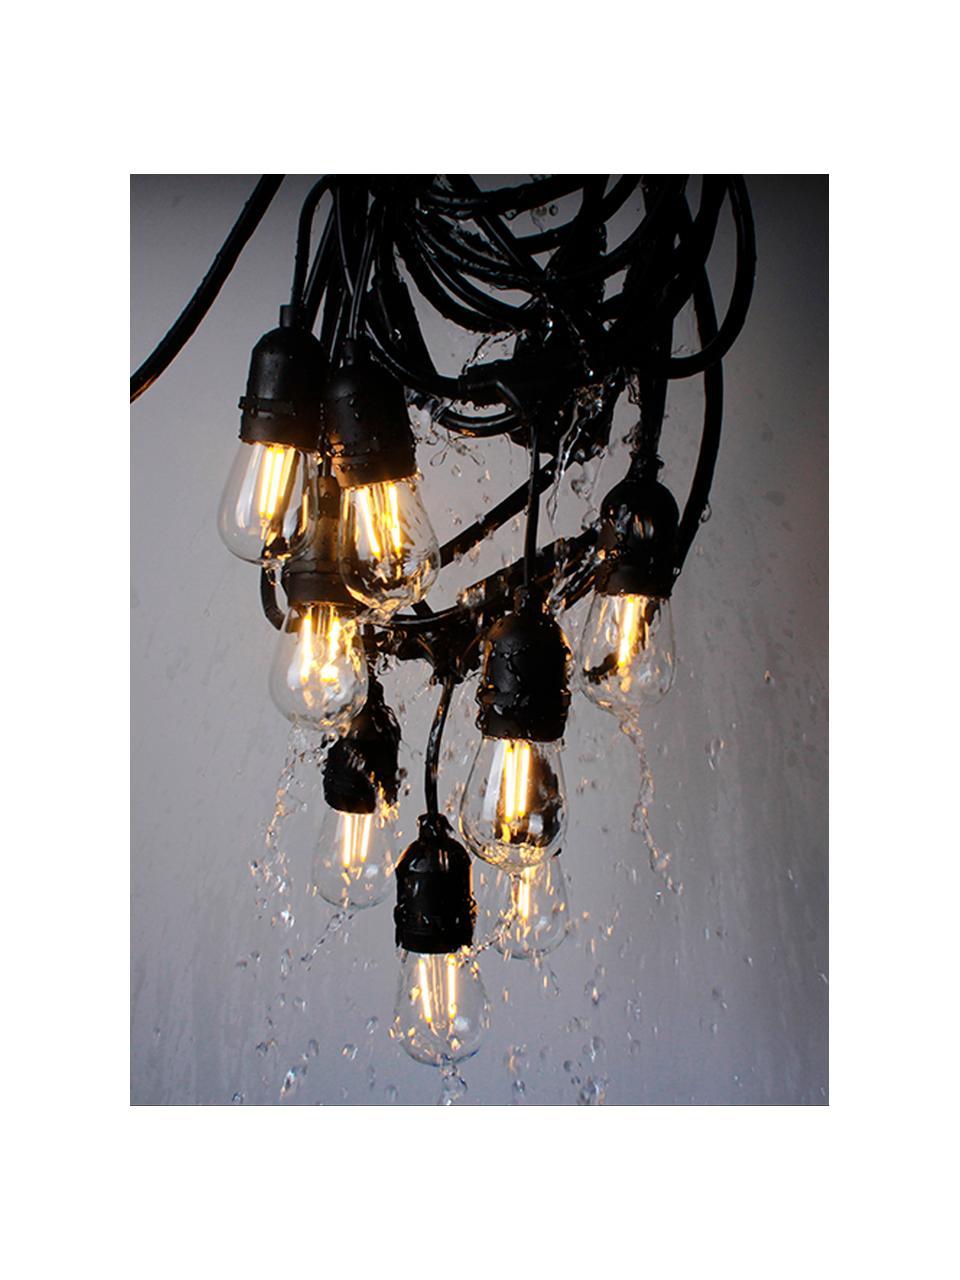 Girlanda świetlna LED Joy, 1000 cm i 10 lampionów, Czarny, D 1000 cm